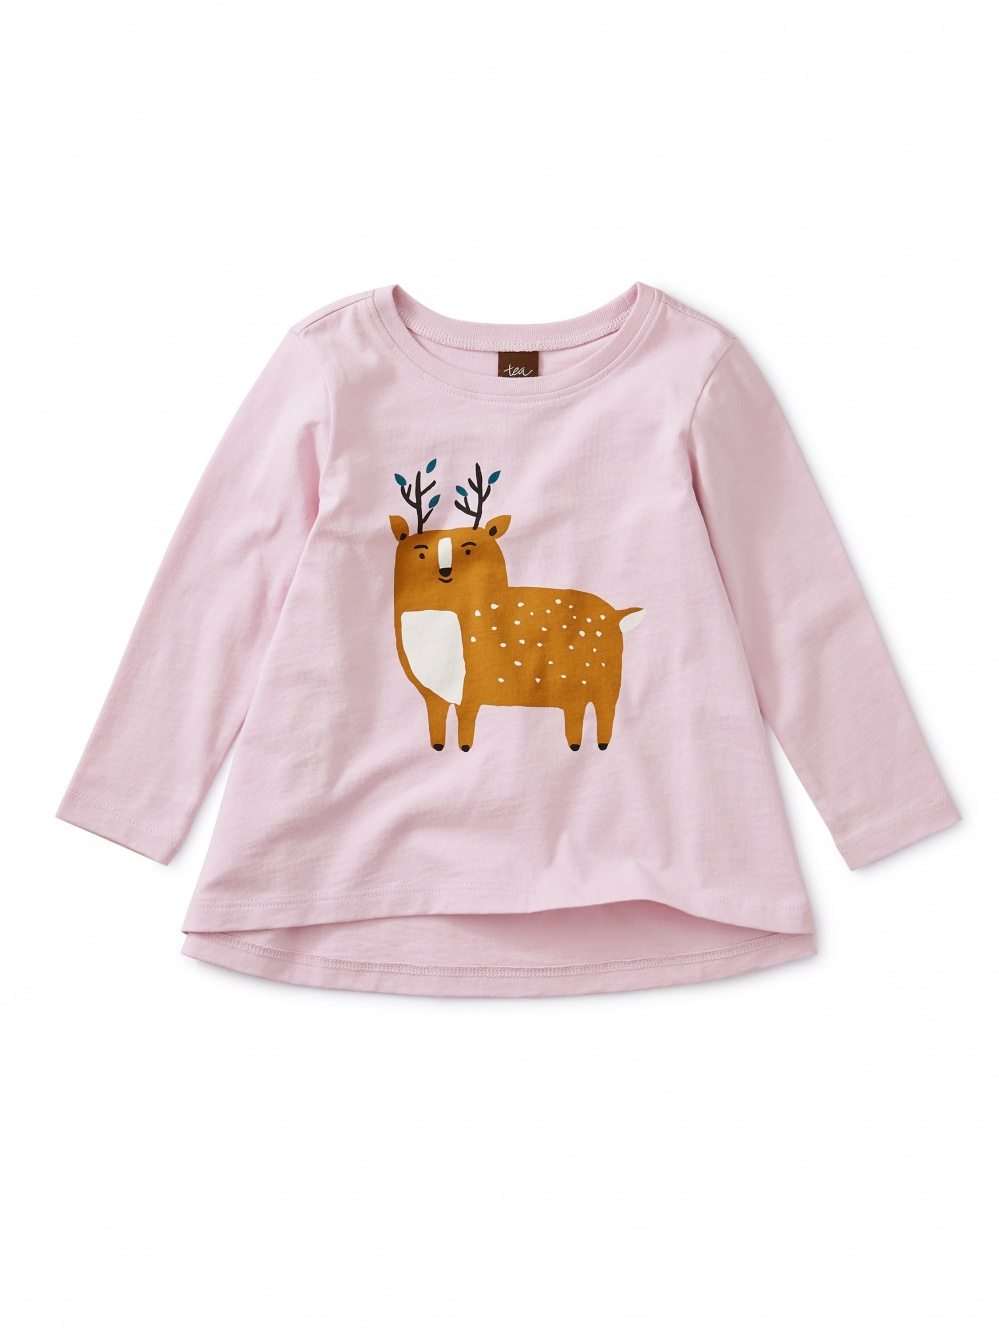 Musk Deer Baby Twirl Tee